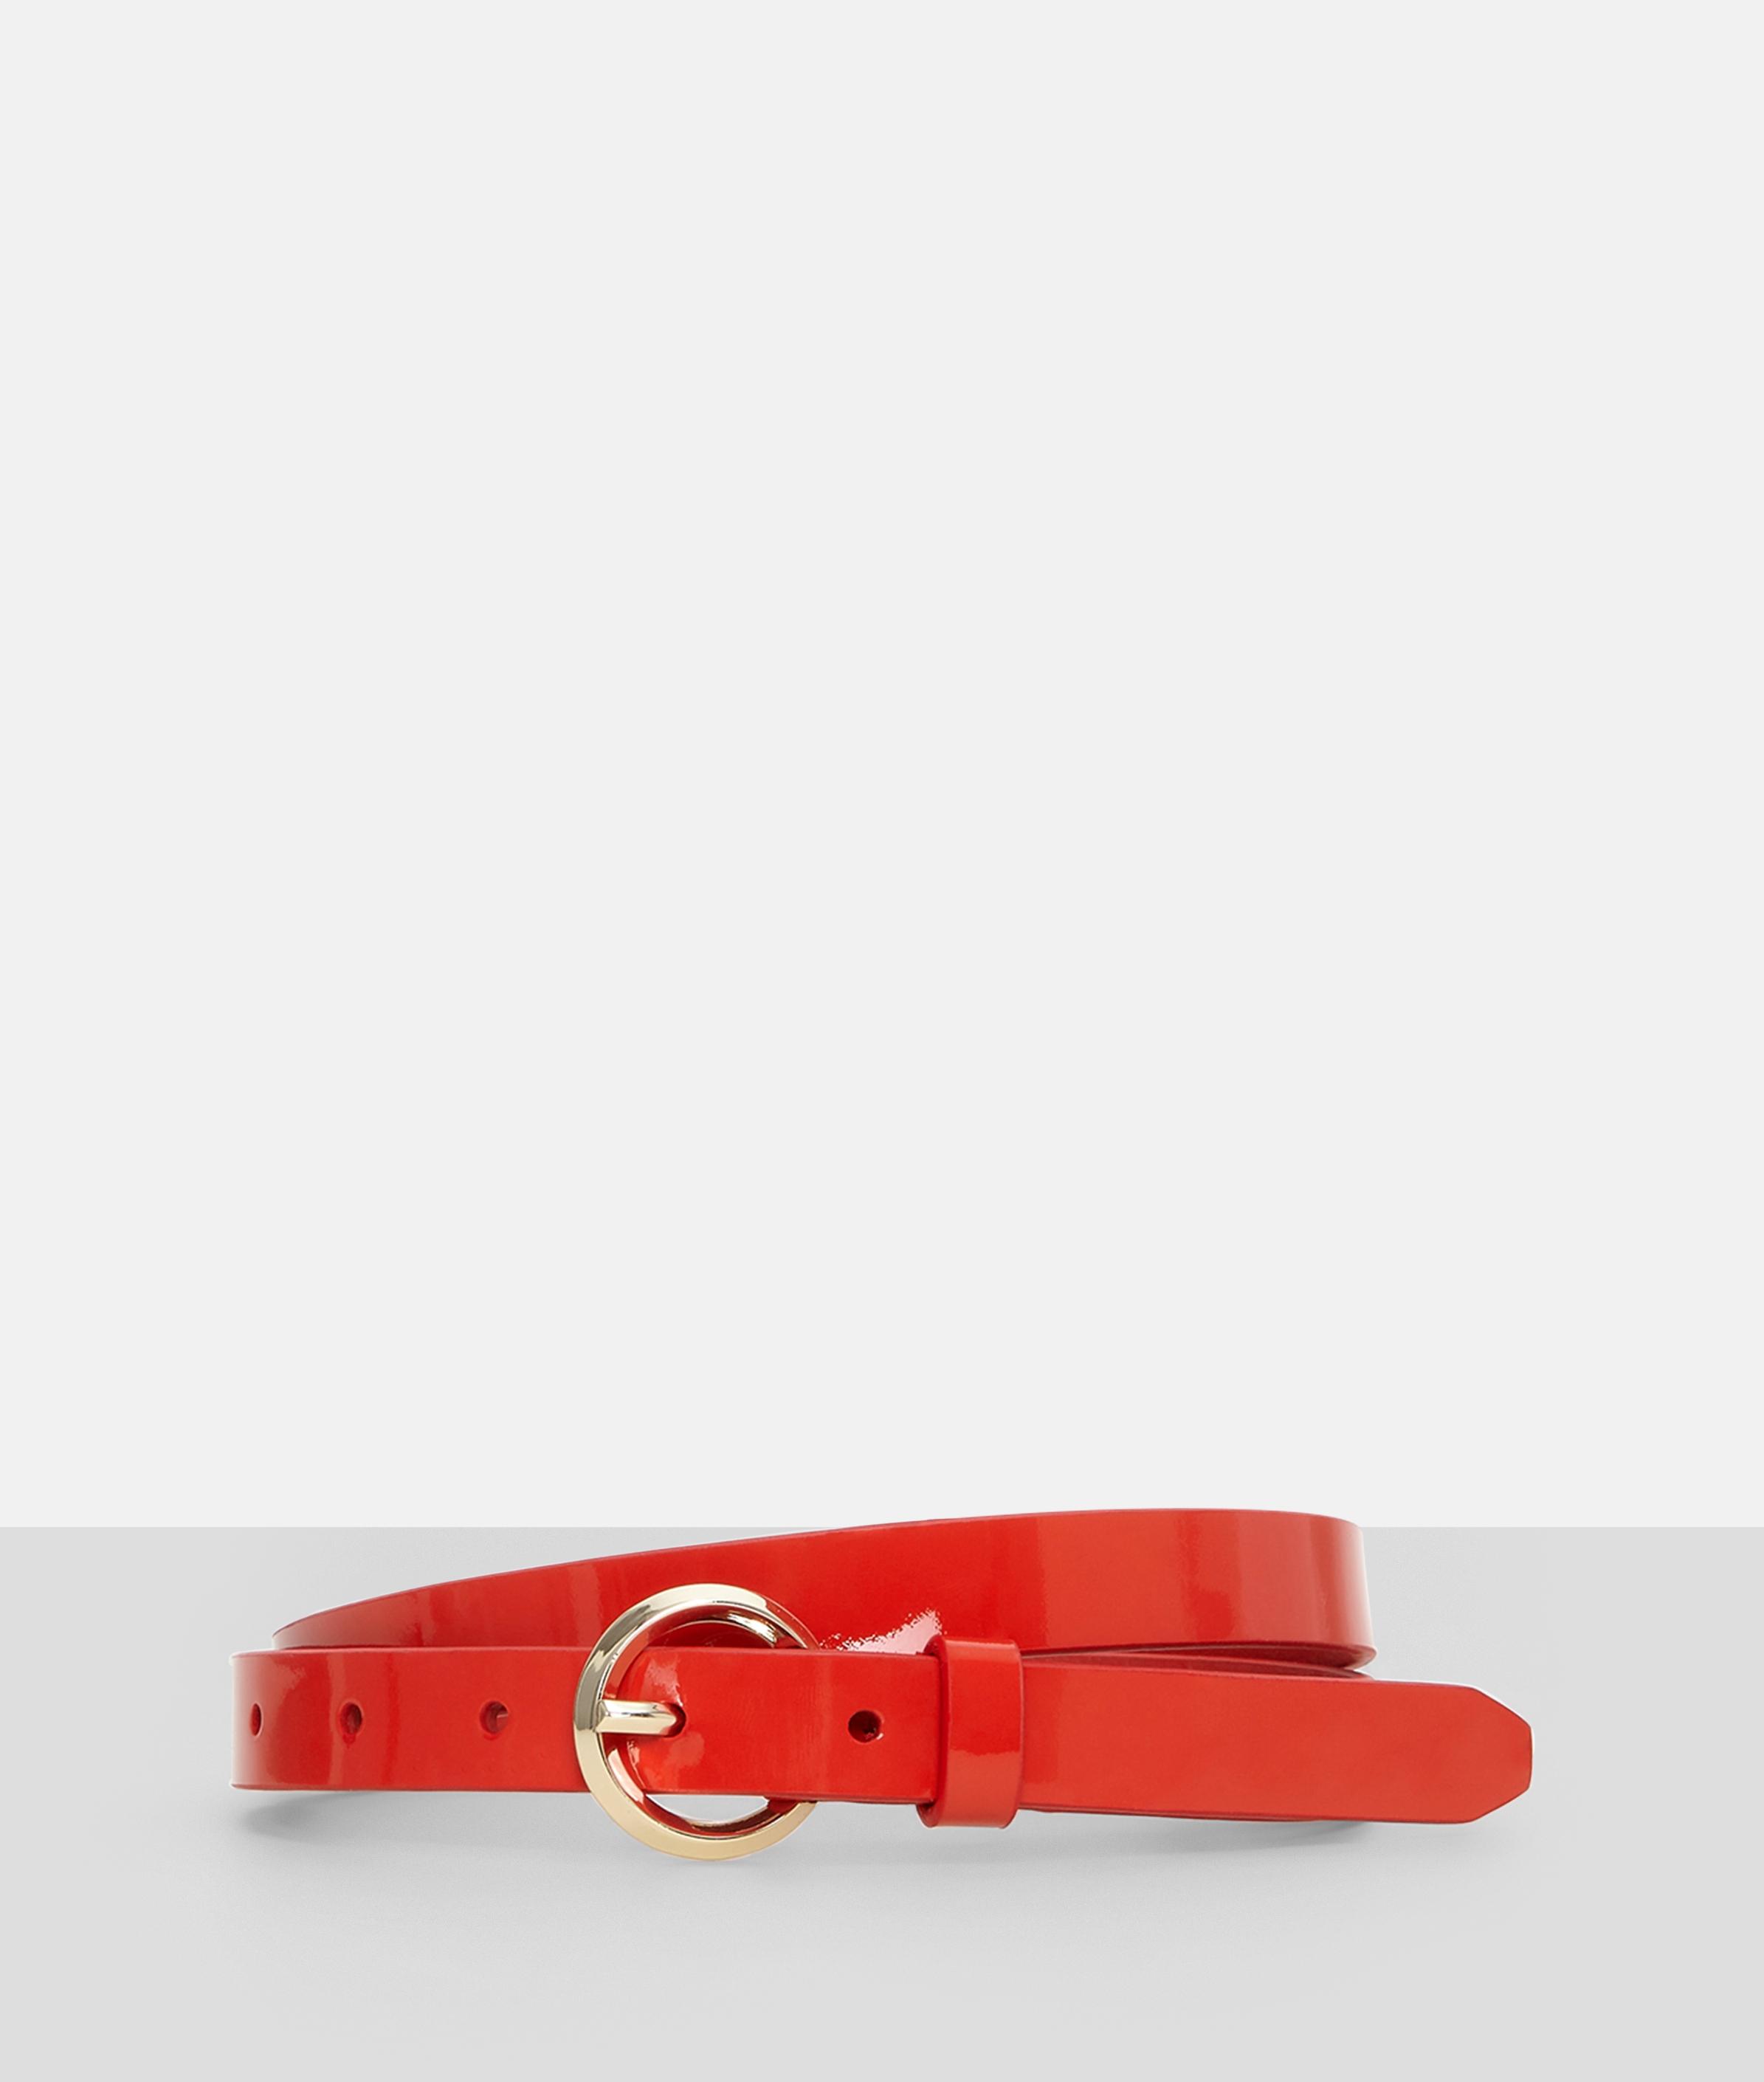 liebeskind berlin - Ledergürtel mit Lack, Rot, Größe 100